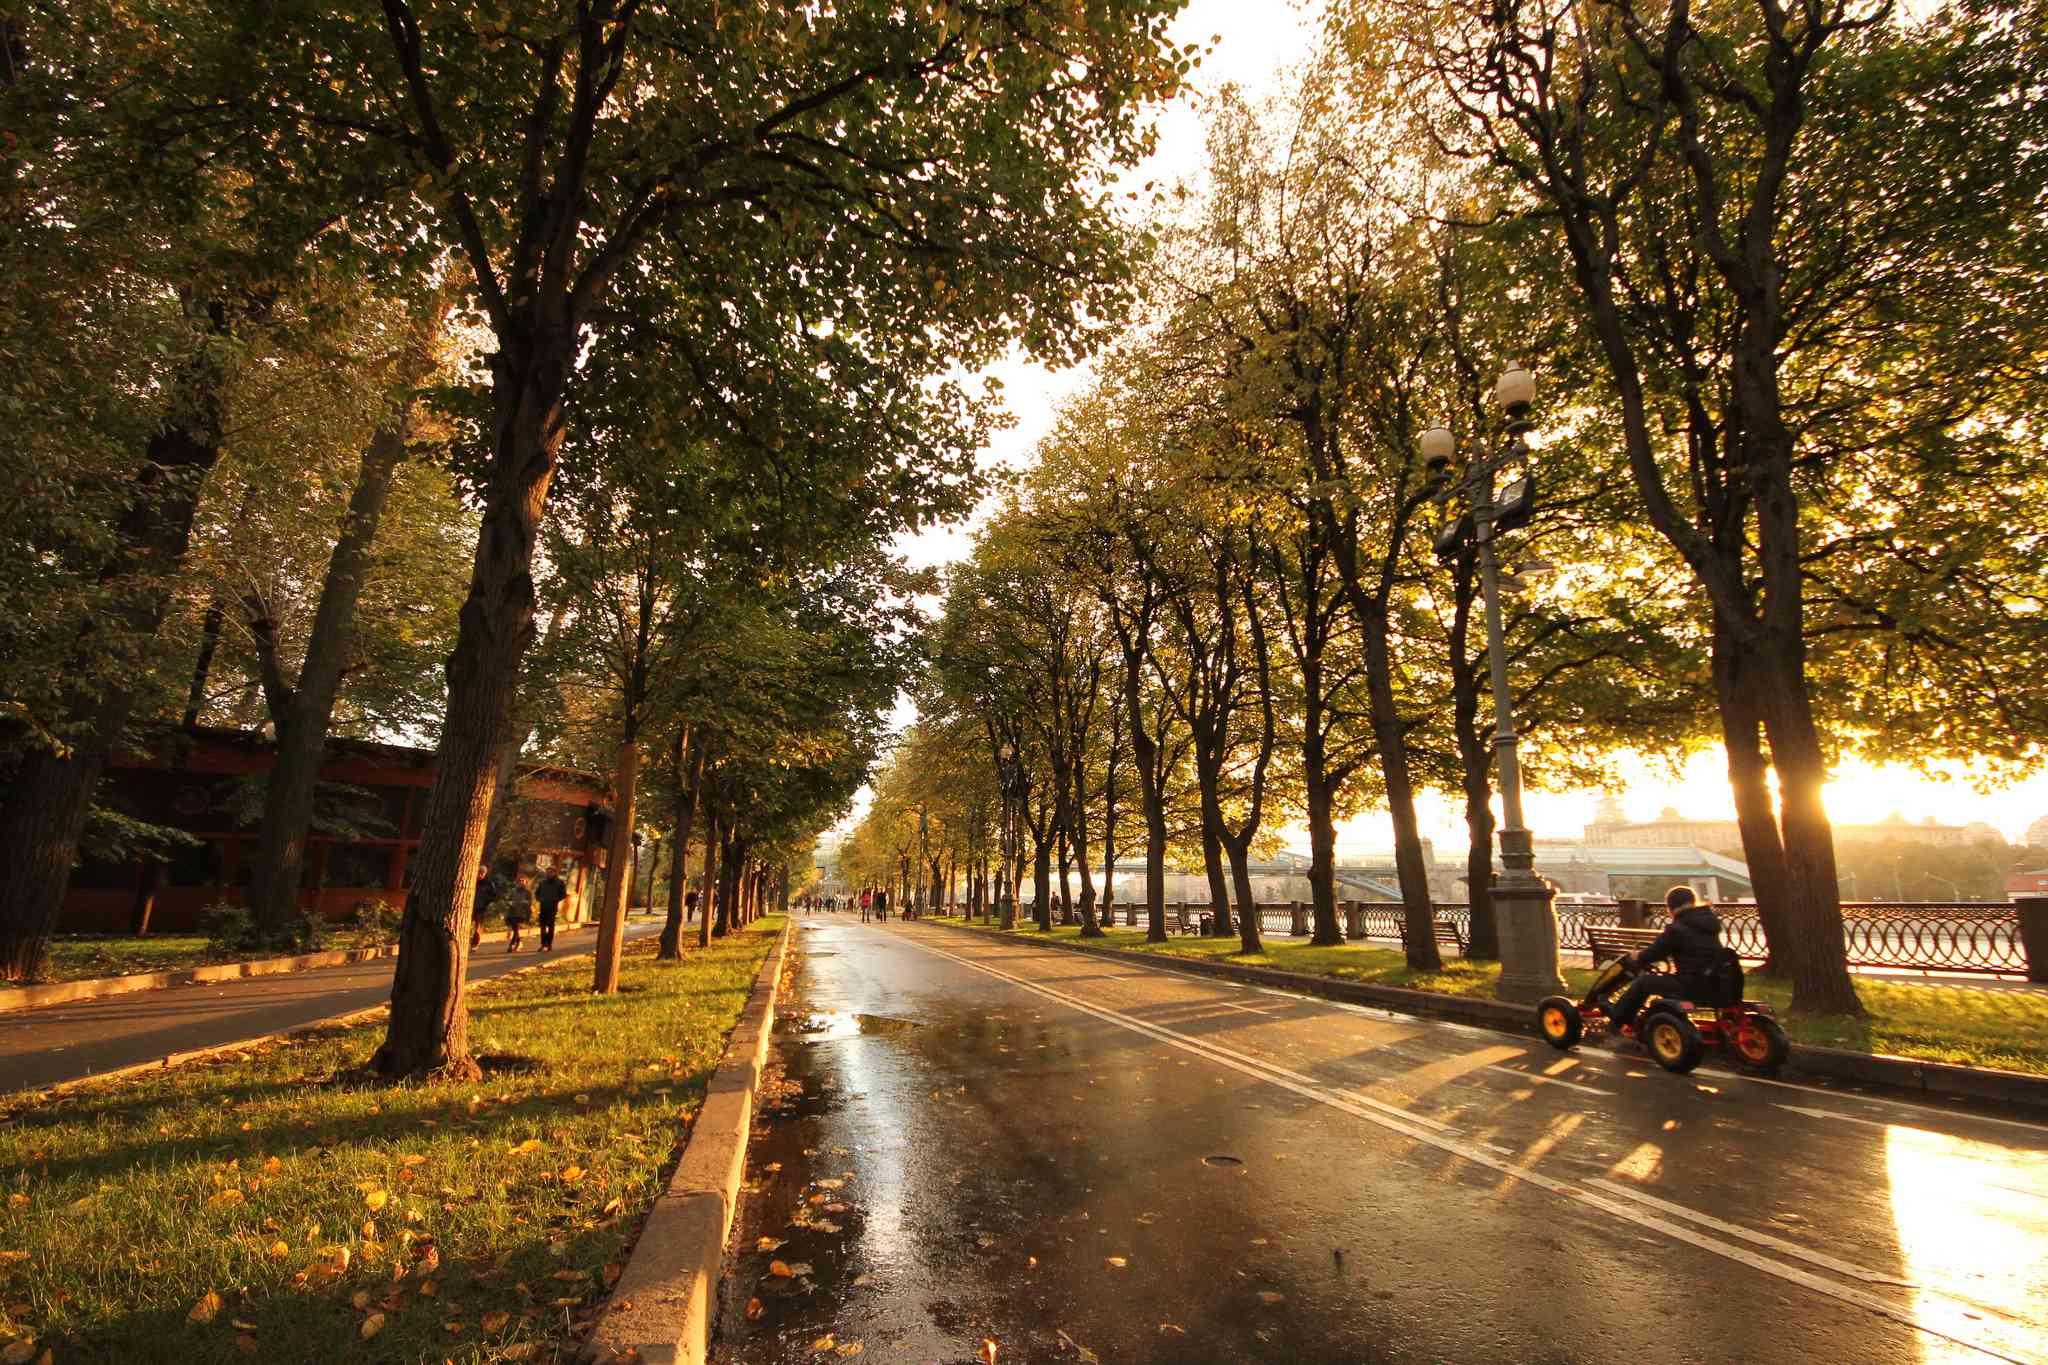 Moscow's Gorky Park